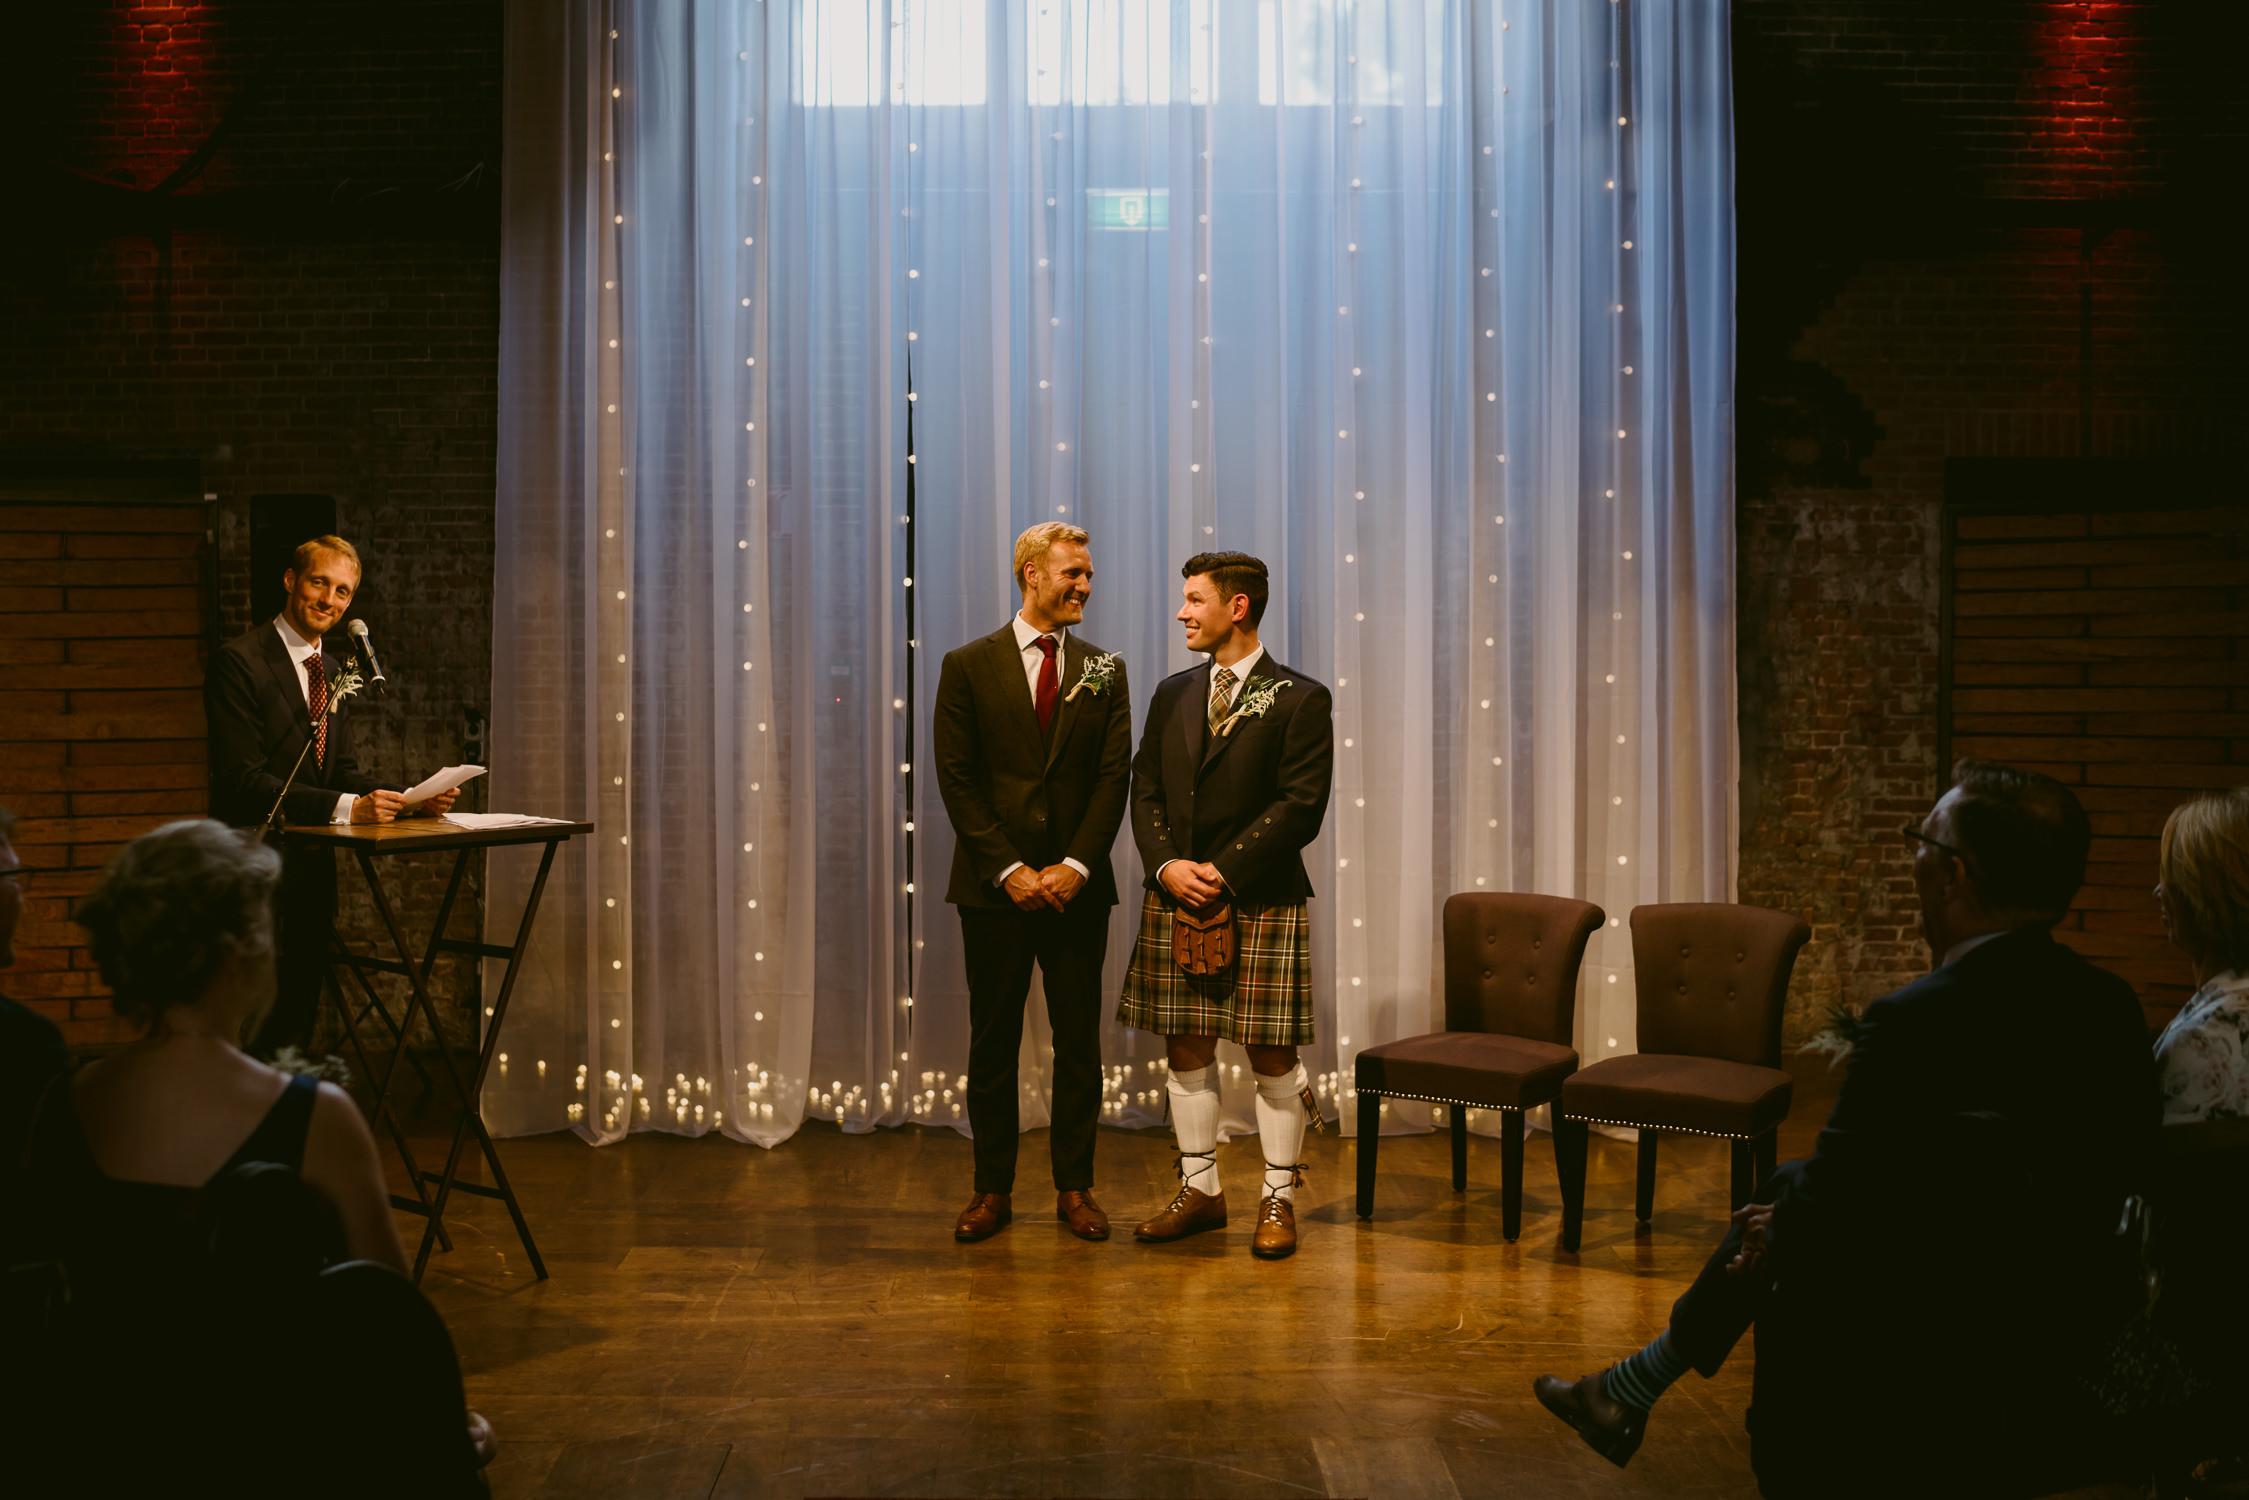 amsterdam-wedding-photographer-trouwfotograaf-bruidsfotograaf-mark-hadden-bruidsfotografie-David & Ronald-187.jpg